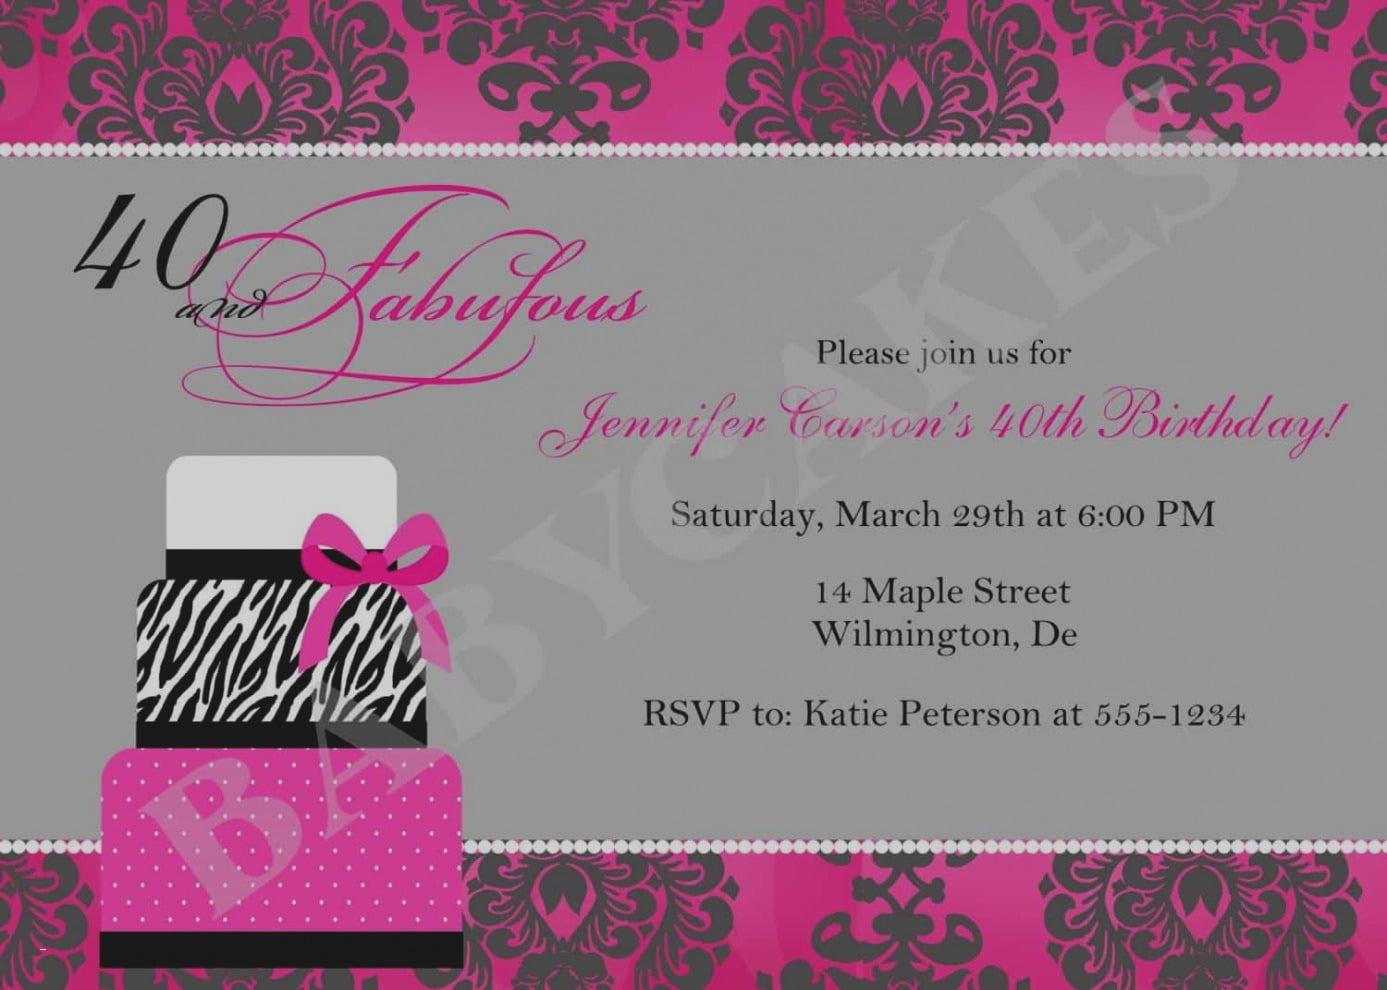 Free 40th Birthday Party Invitation Templates Simple Fresh Bday